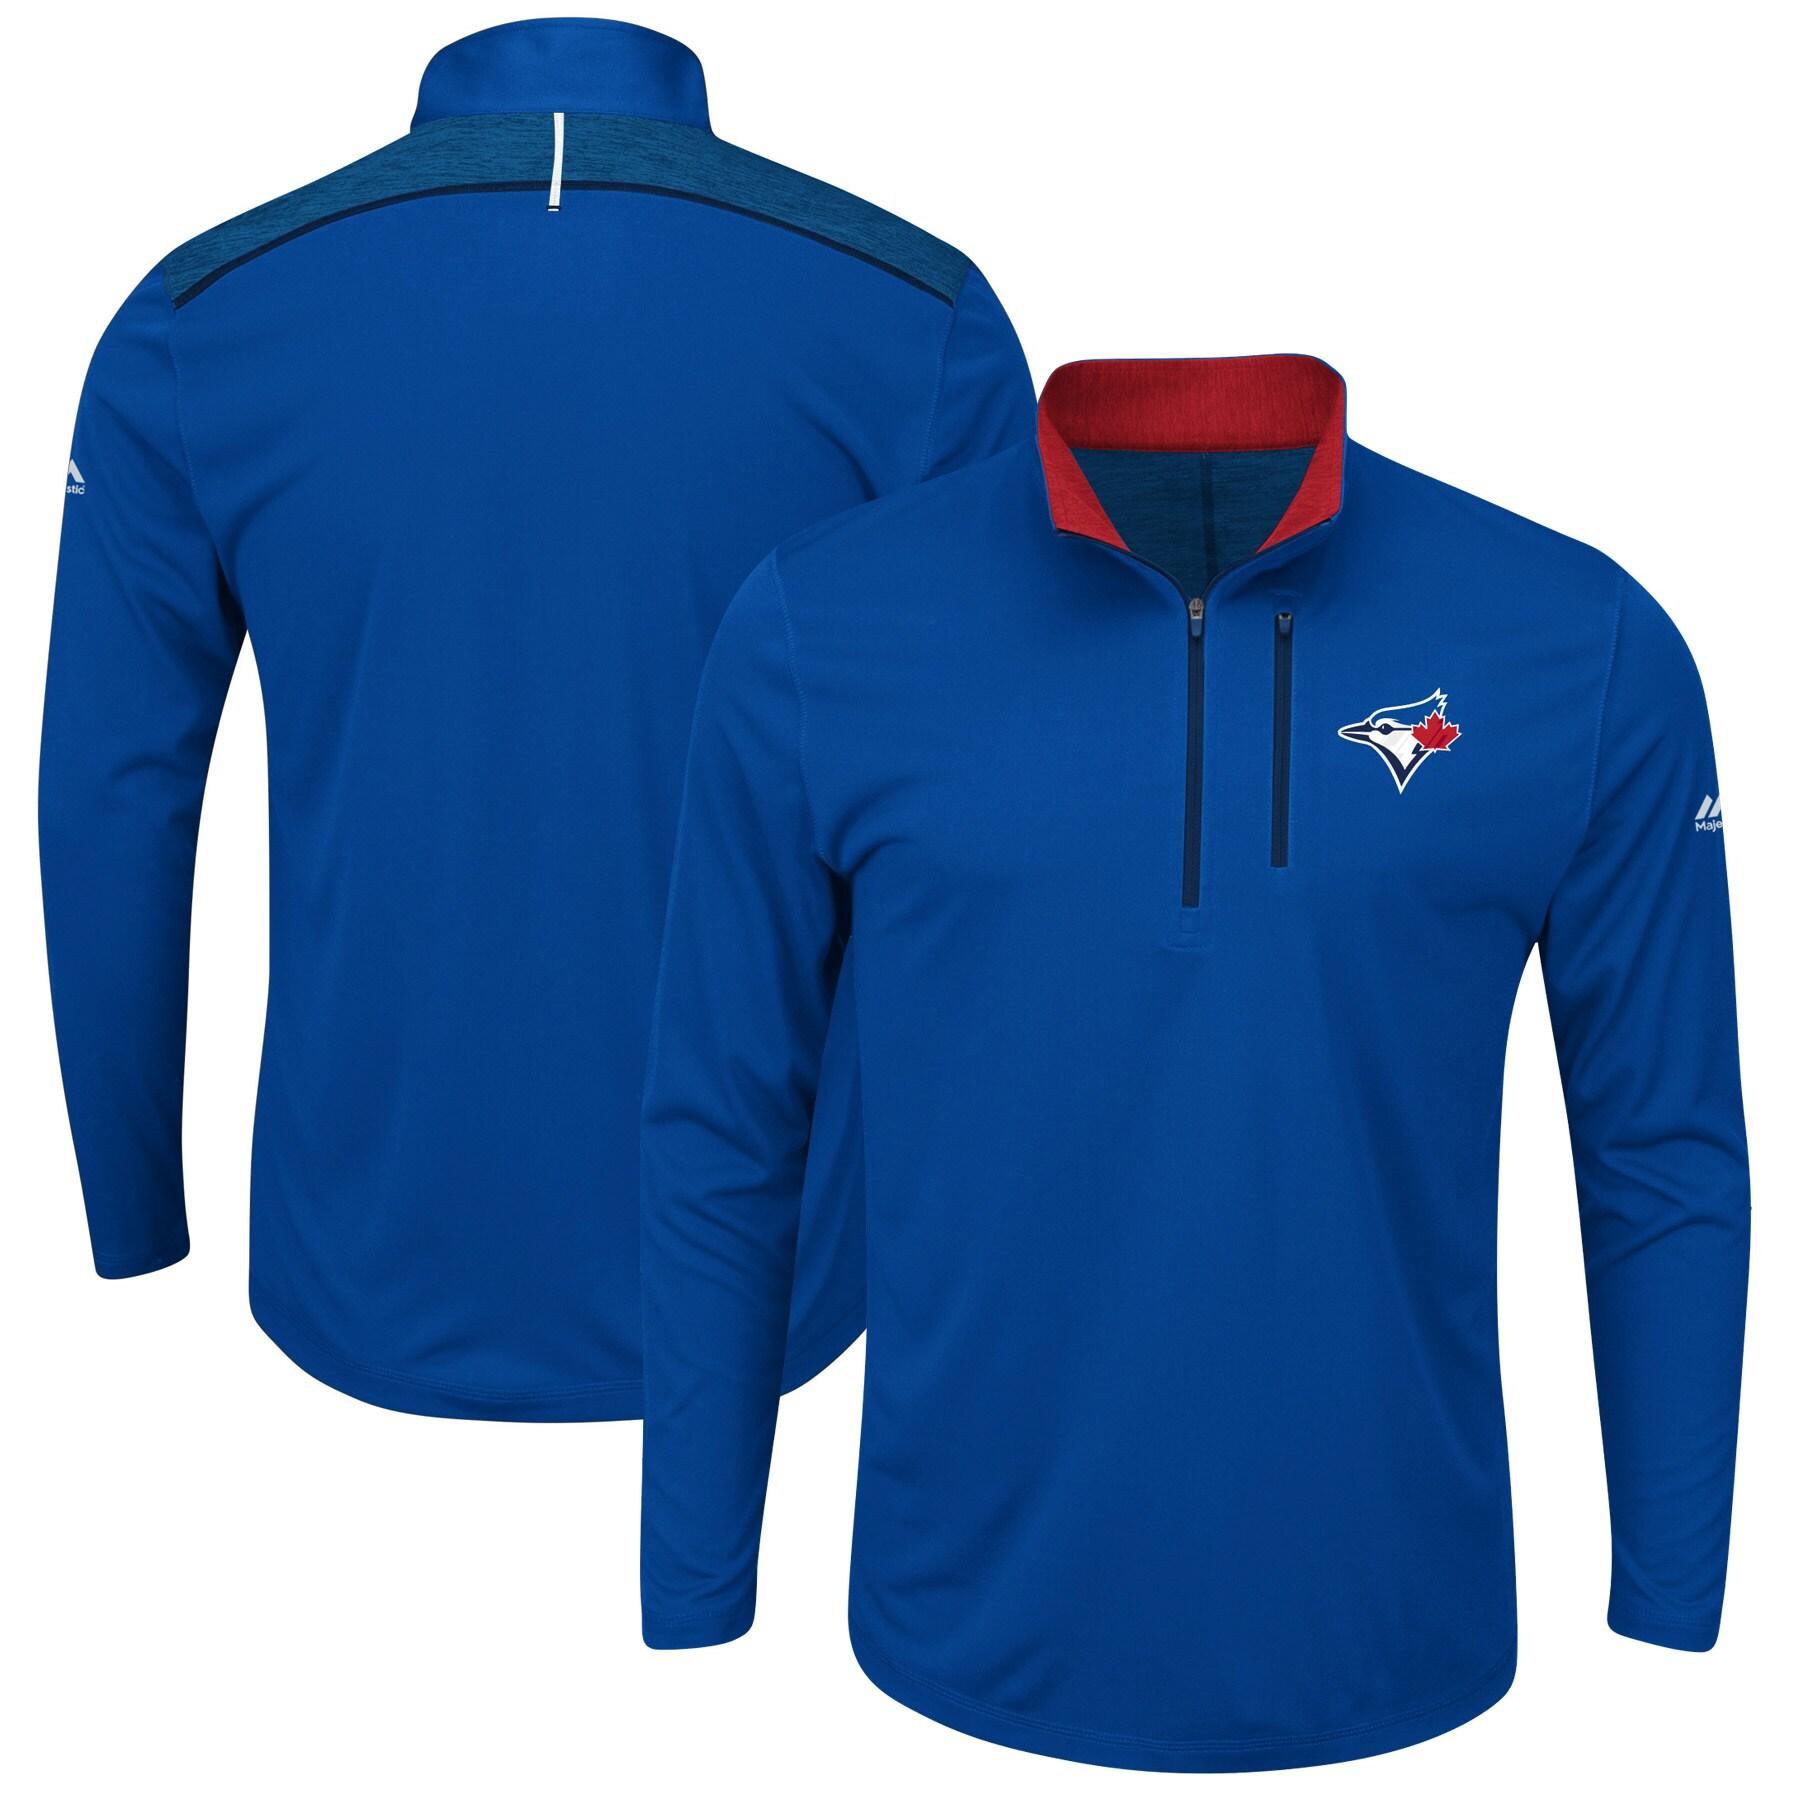 Toronto Blue Jays Majestic Big & Tall 643 Half-Zip Pullover Jacket - Royal